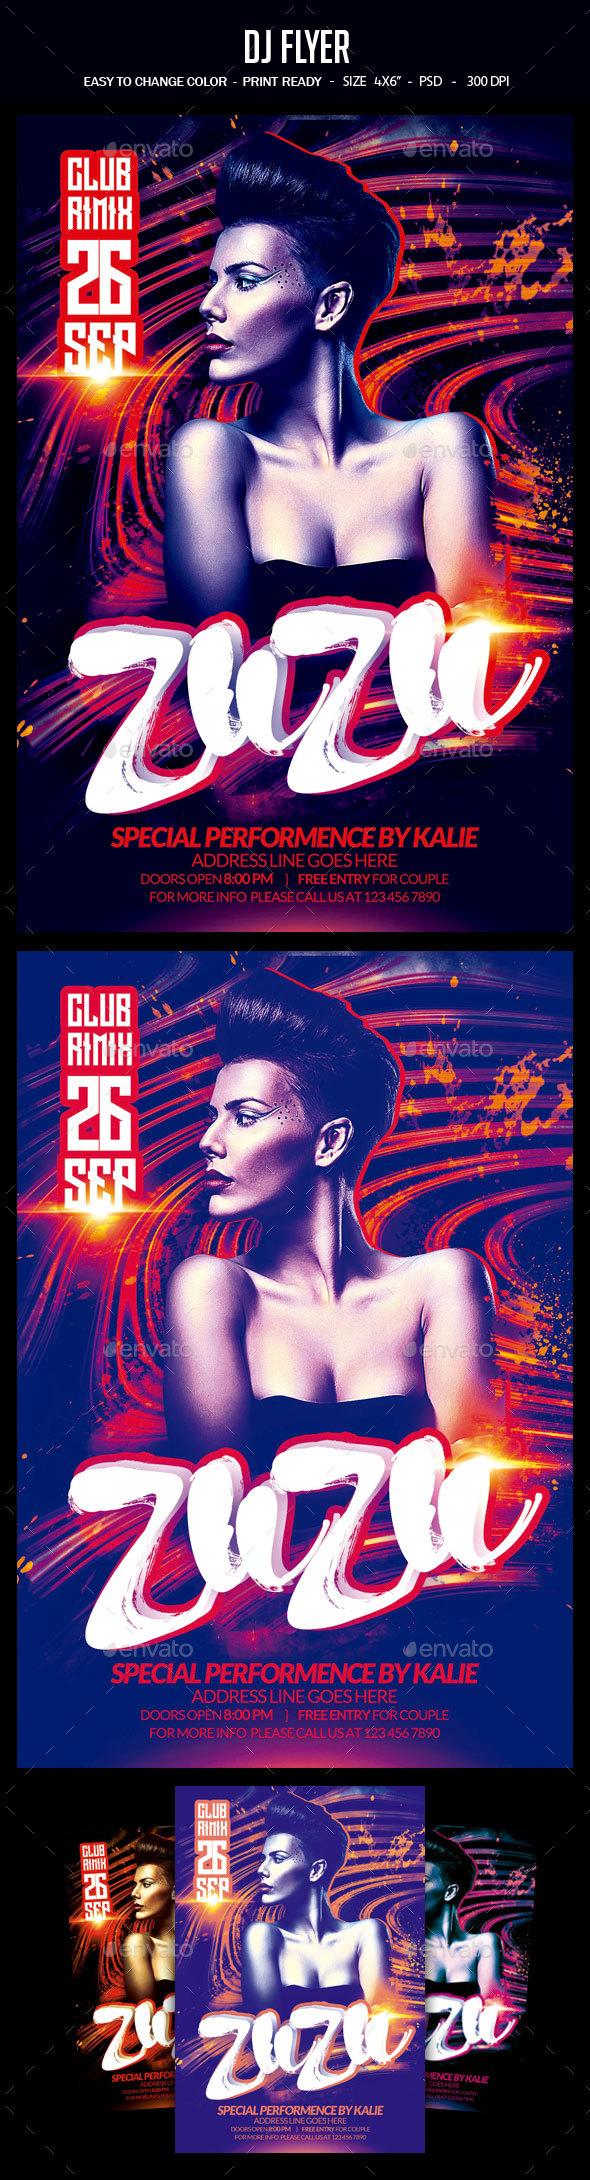 Dj Flyer - Clubs & Parties Events